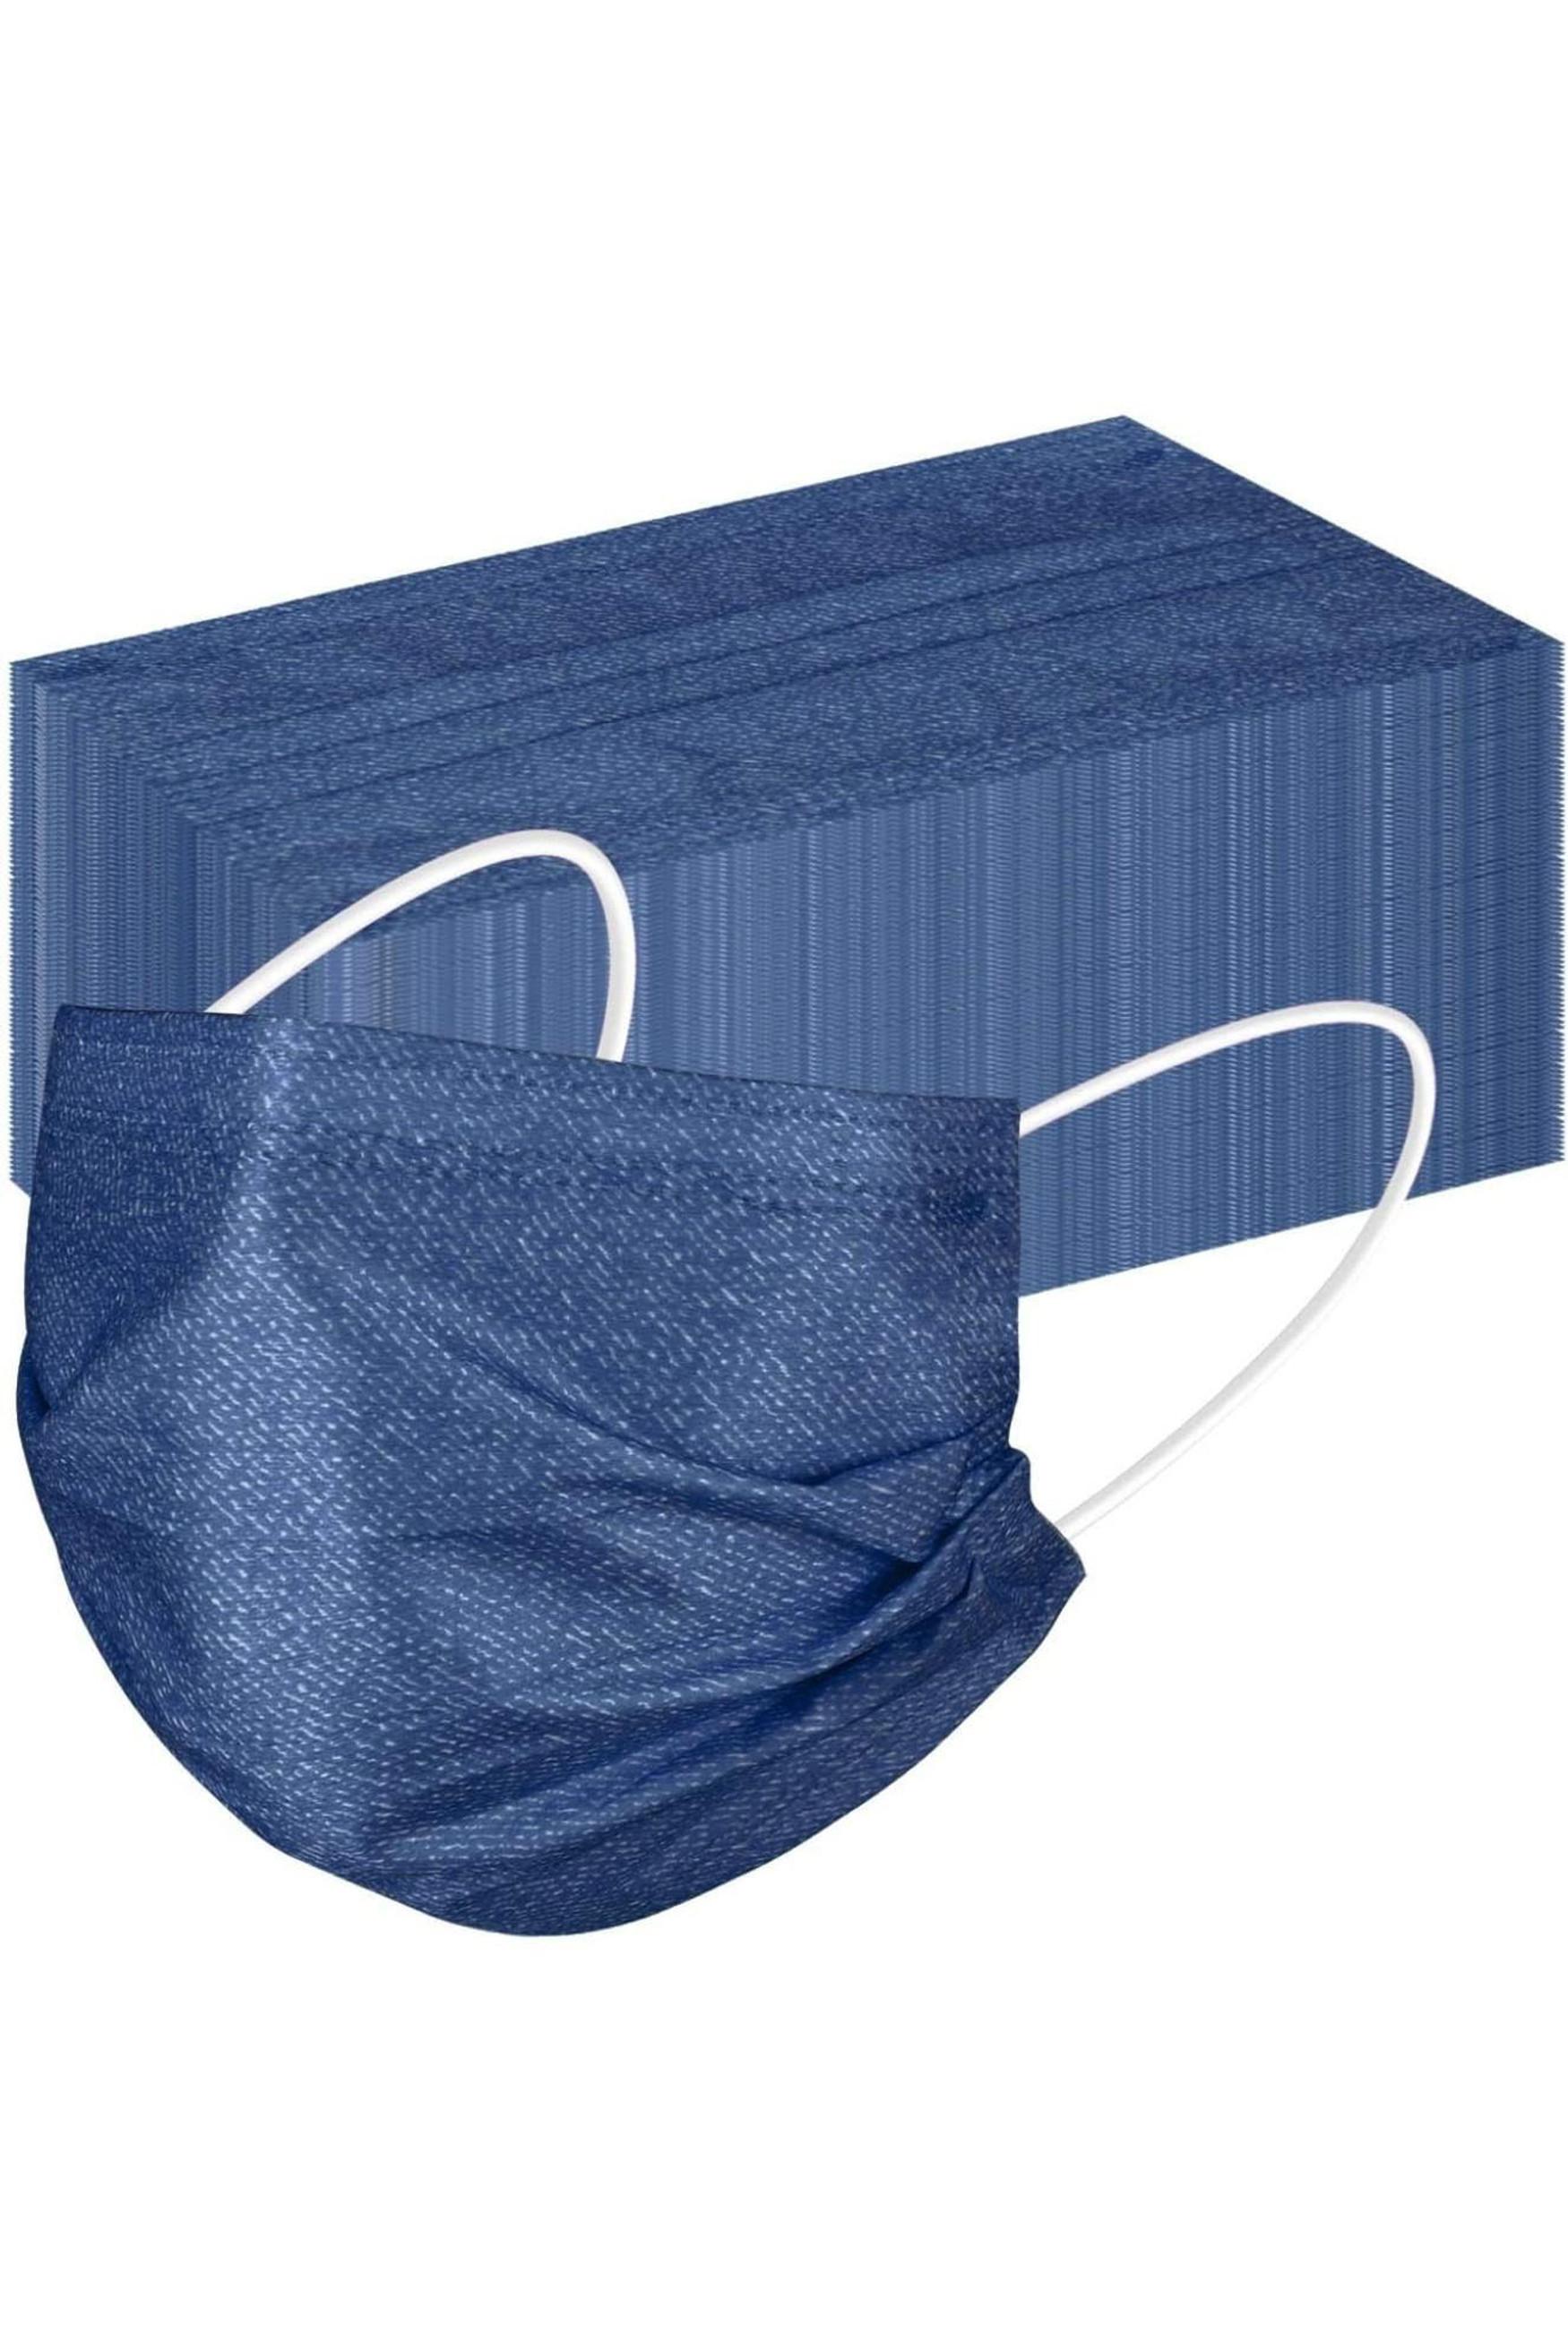 Blue Denim Disposable Surgical Face Mask - 50 Pack